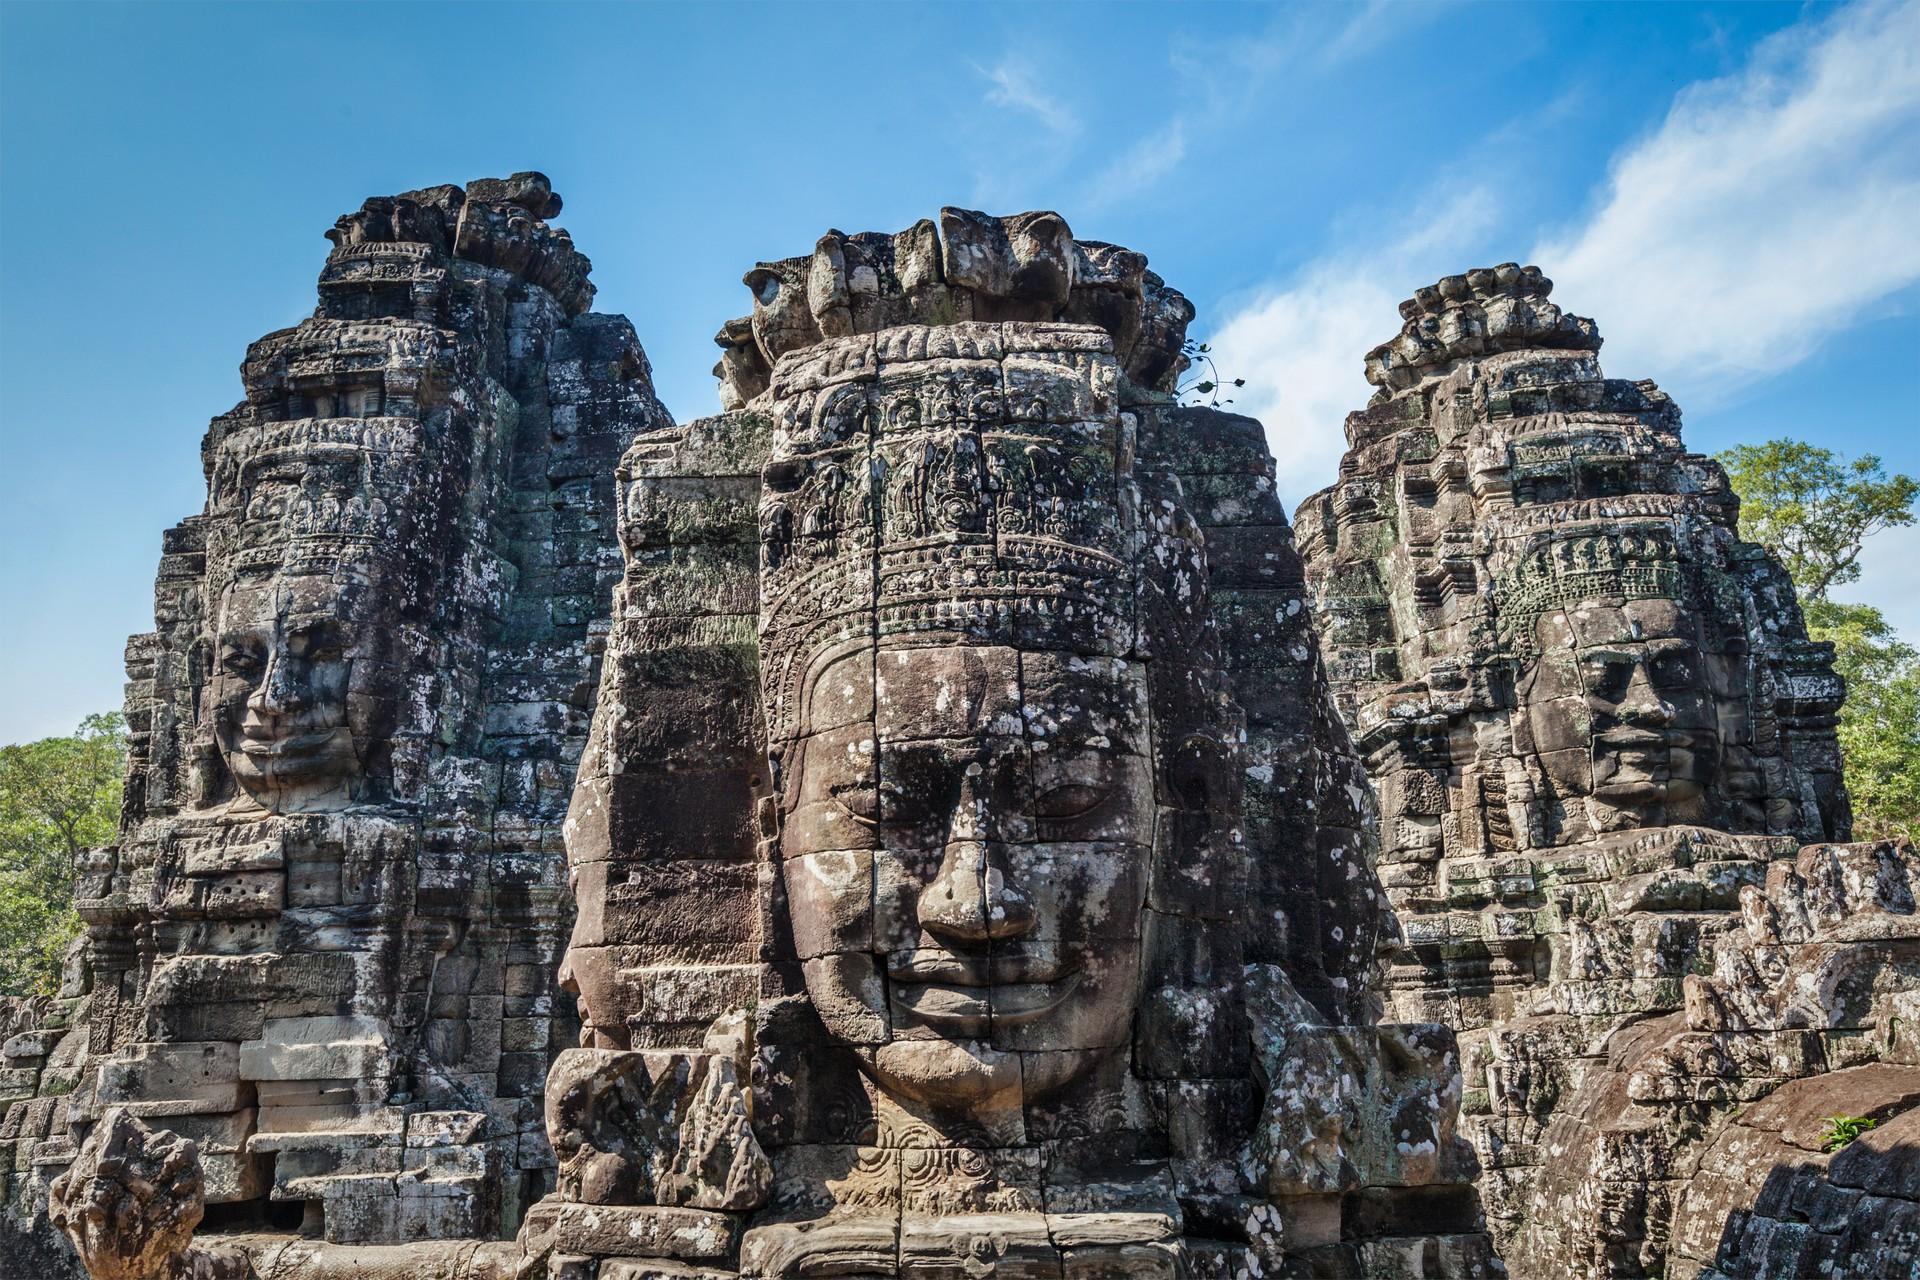 Faces on Bayon Temple, Angkor Thom